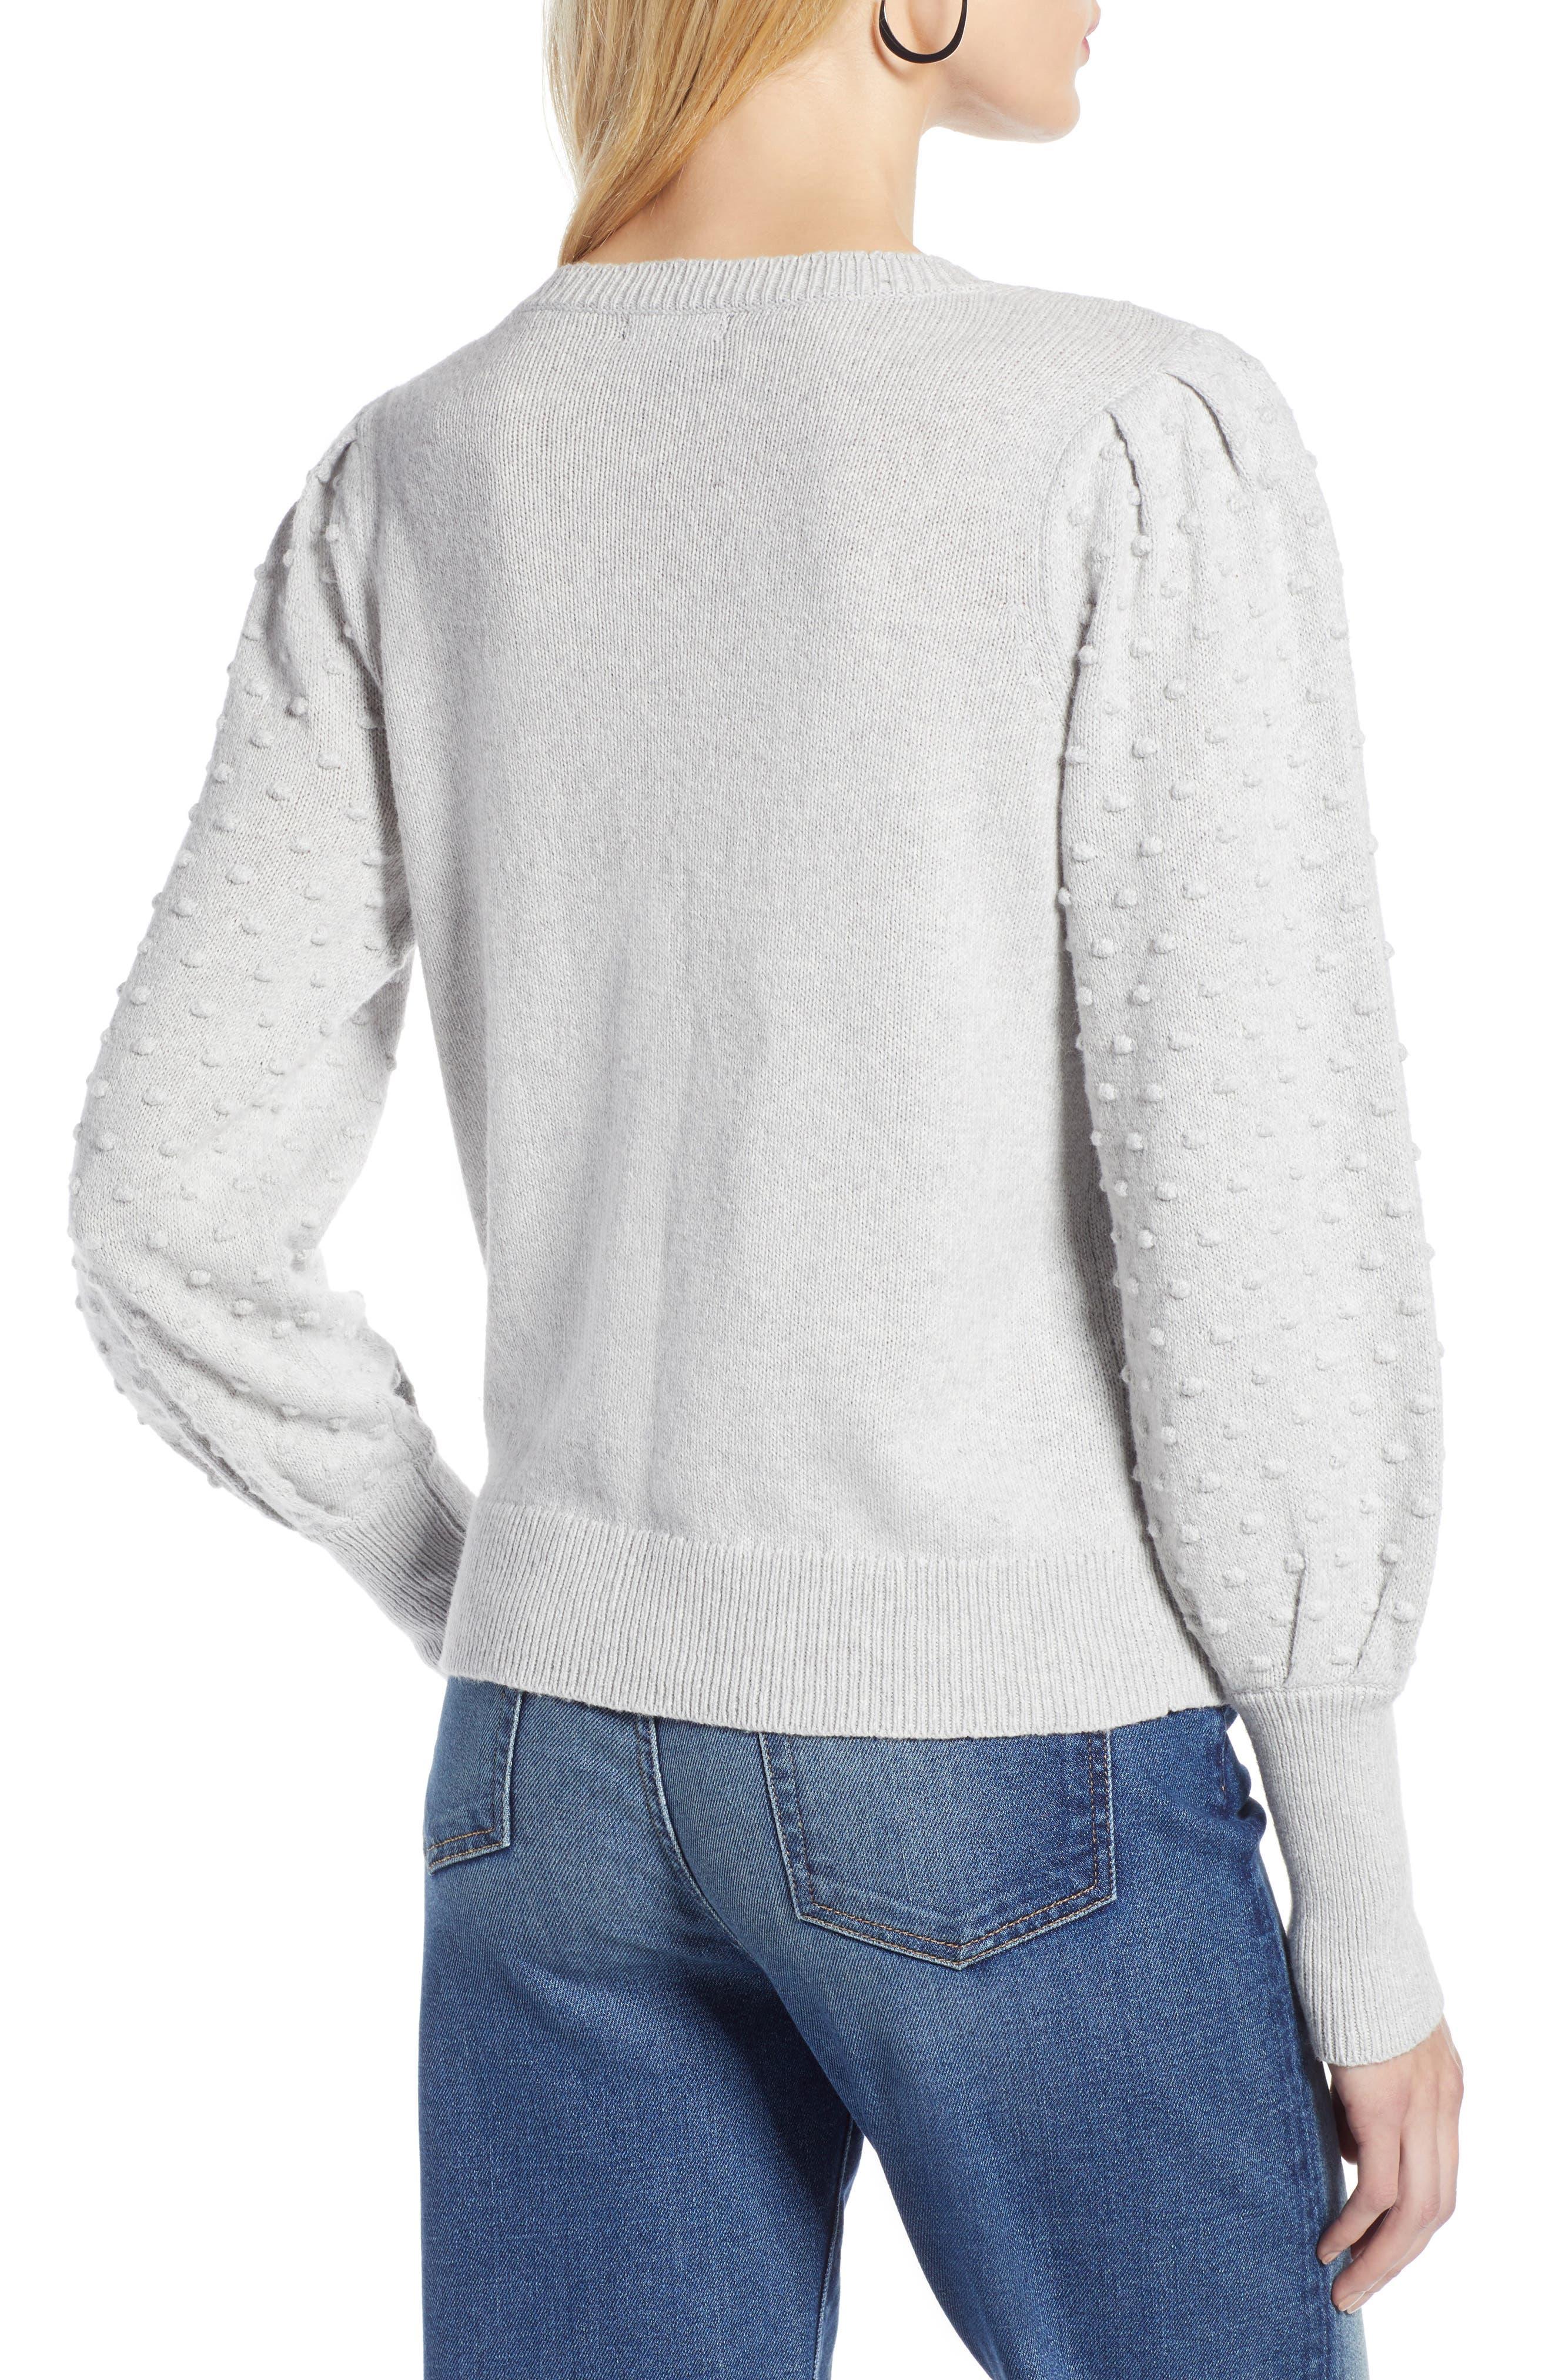 Bobble Stitch Sweater,                             Alternate thumbnail 2, color,                             GREY LIGHT HEATHER